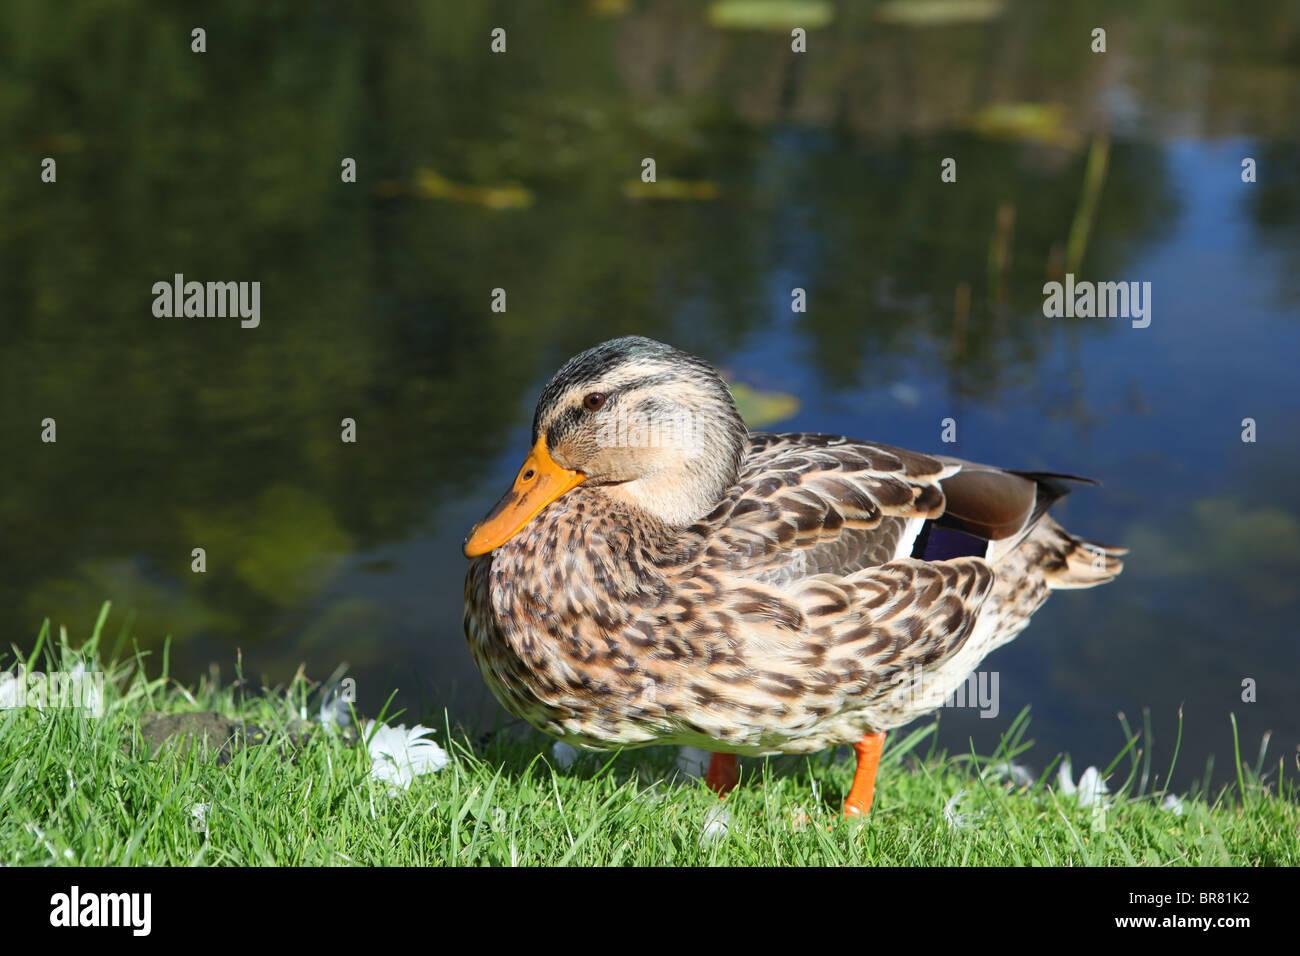 Ducks - Stock Image